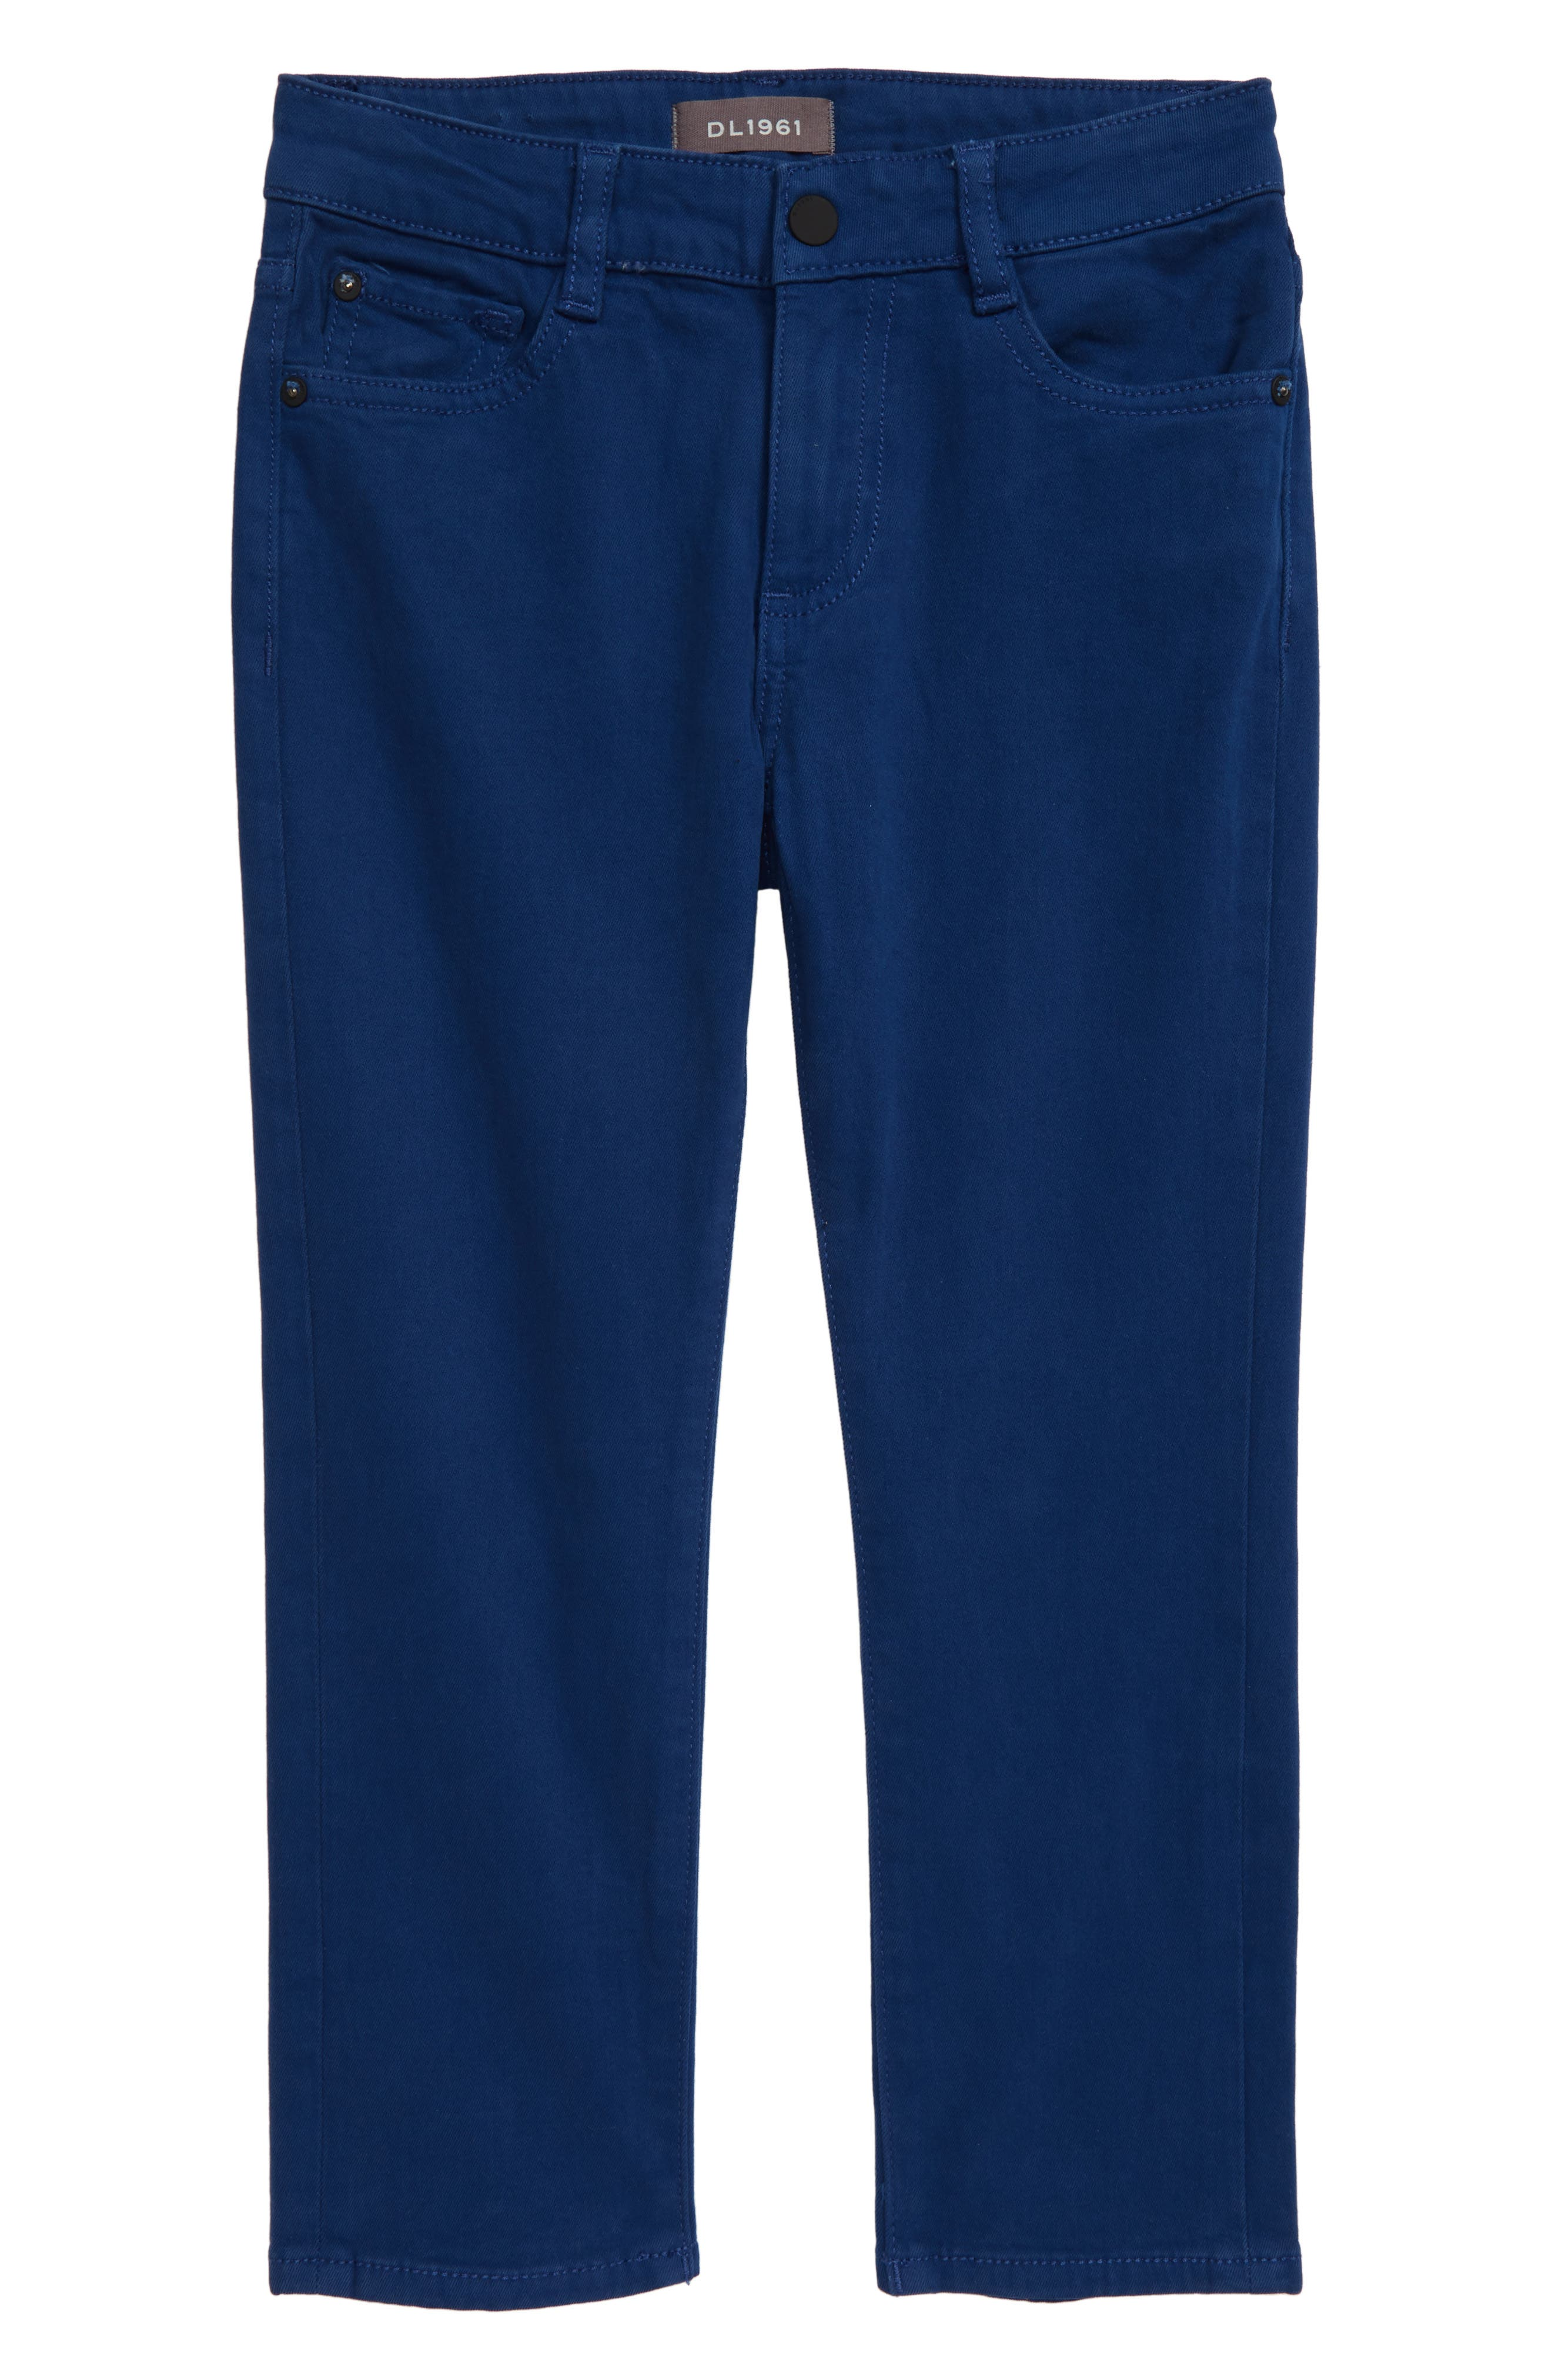 Boys Dl1961 Brady Slim Fit Jeans Size 7  Blue